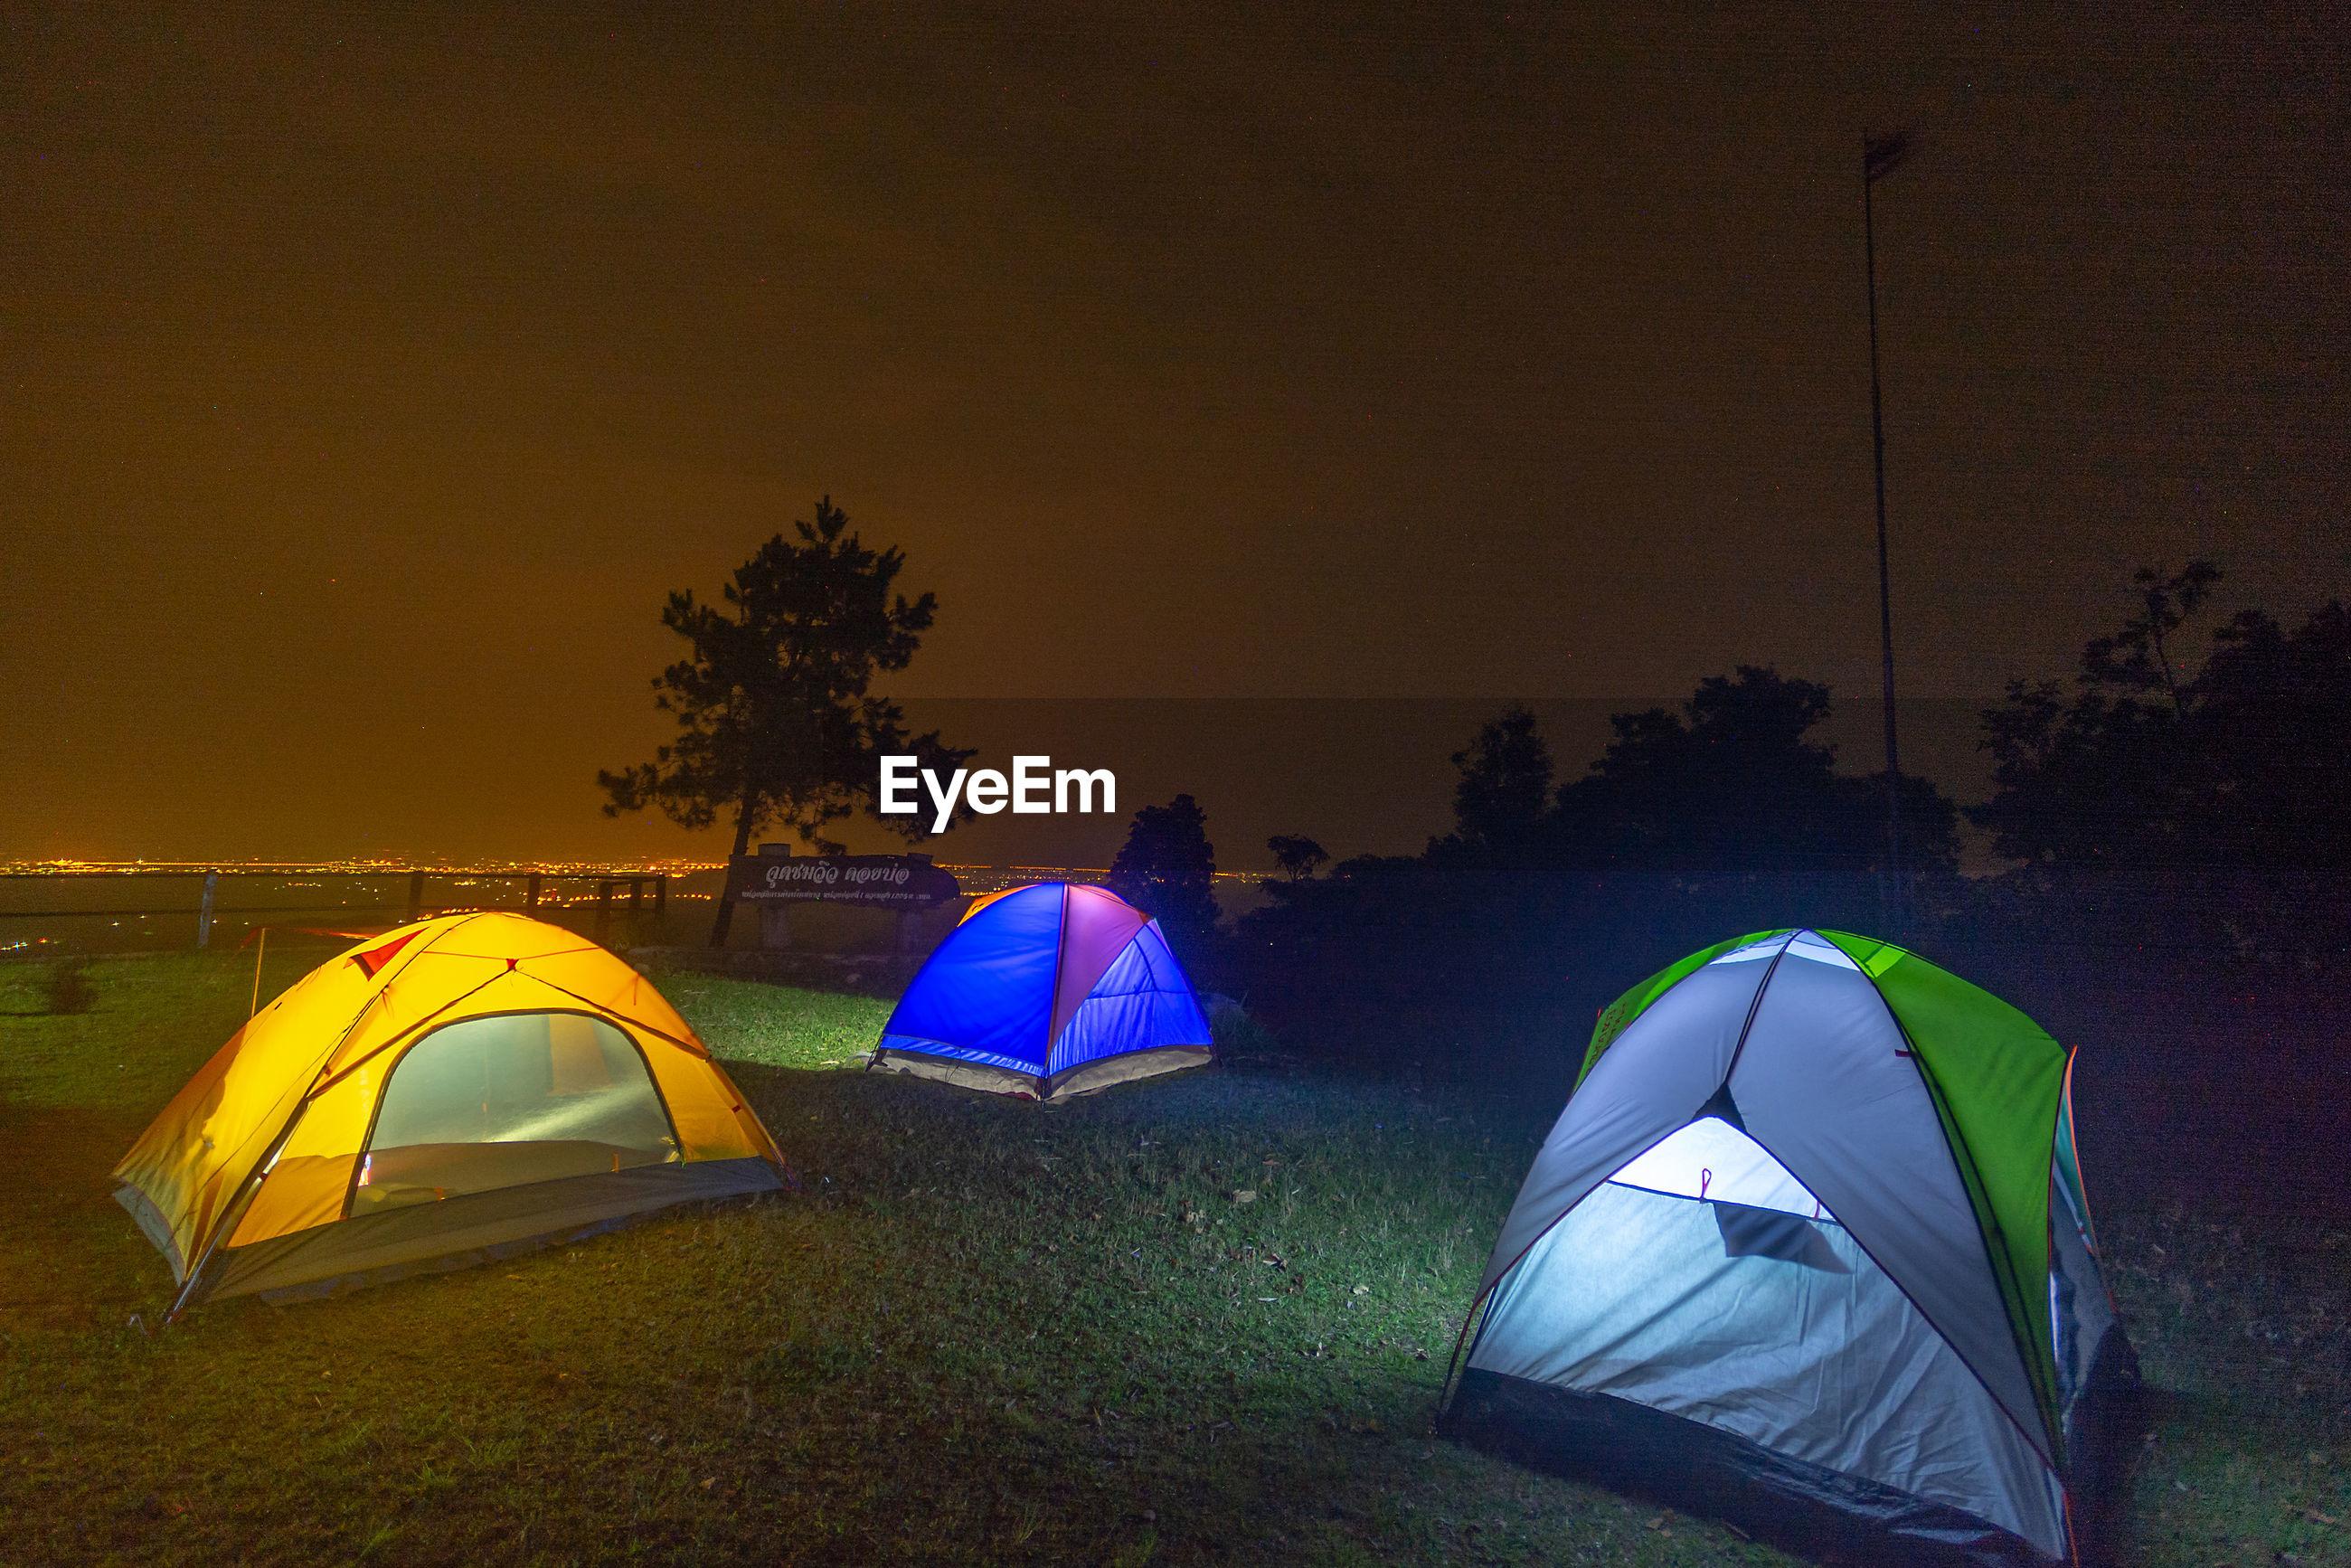 Illuminated tents on land against sky at night